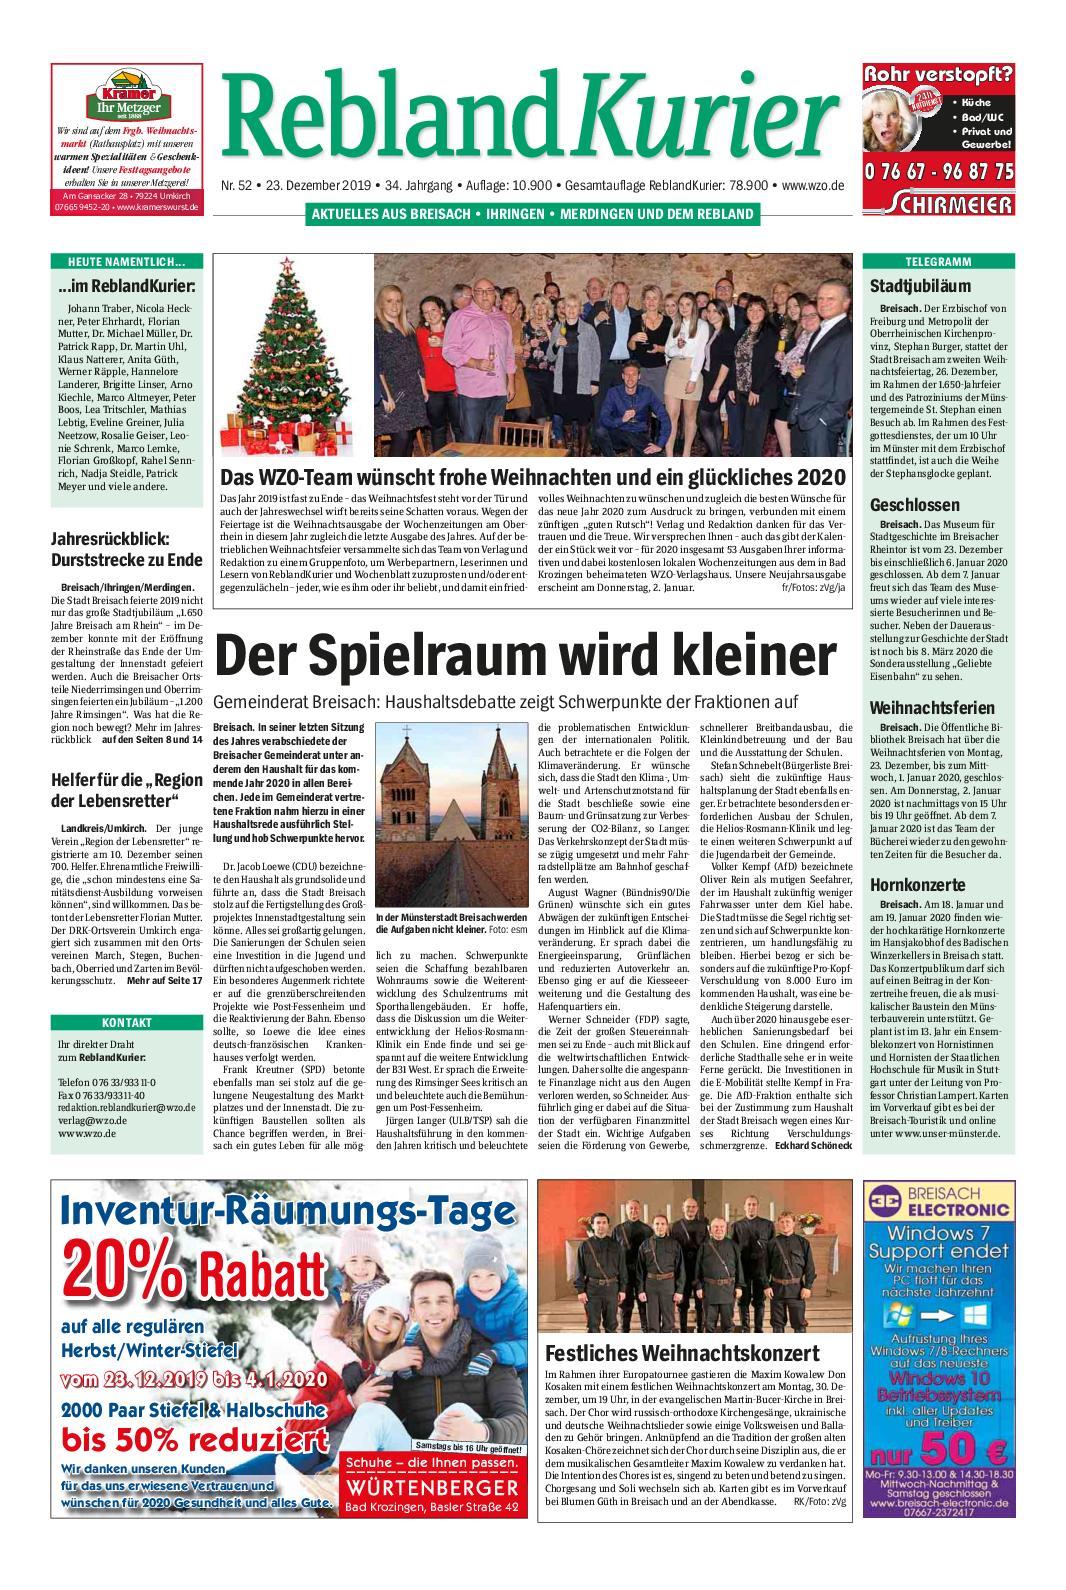 Whore Vogtsburg im Kaiserstuhl